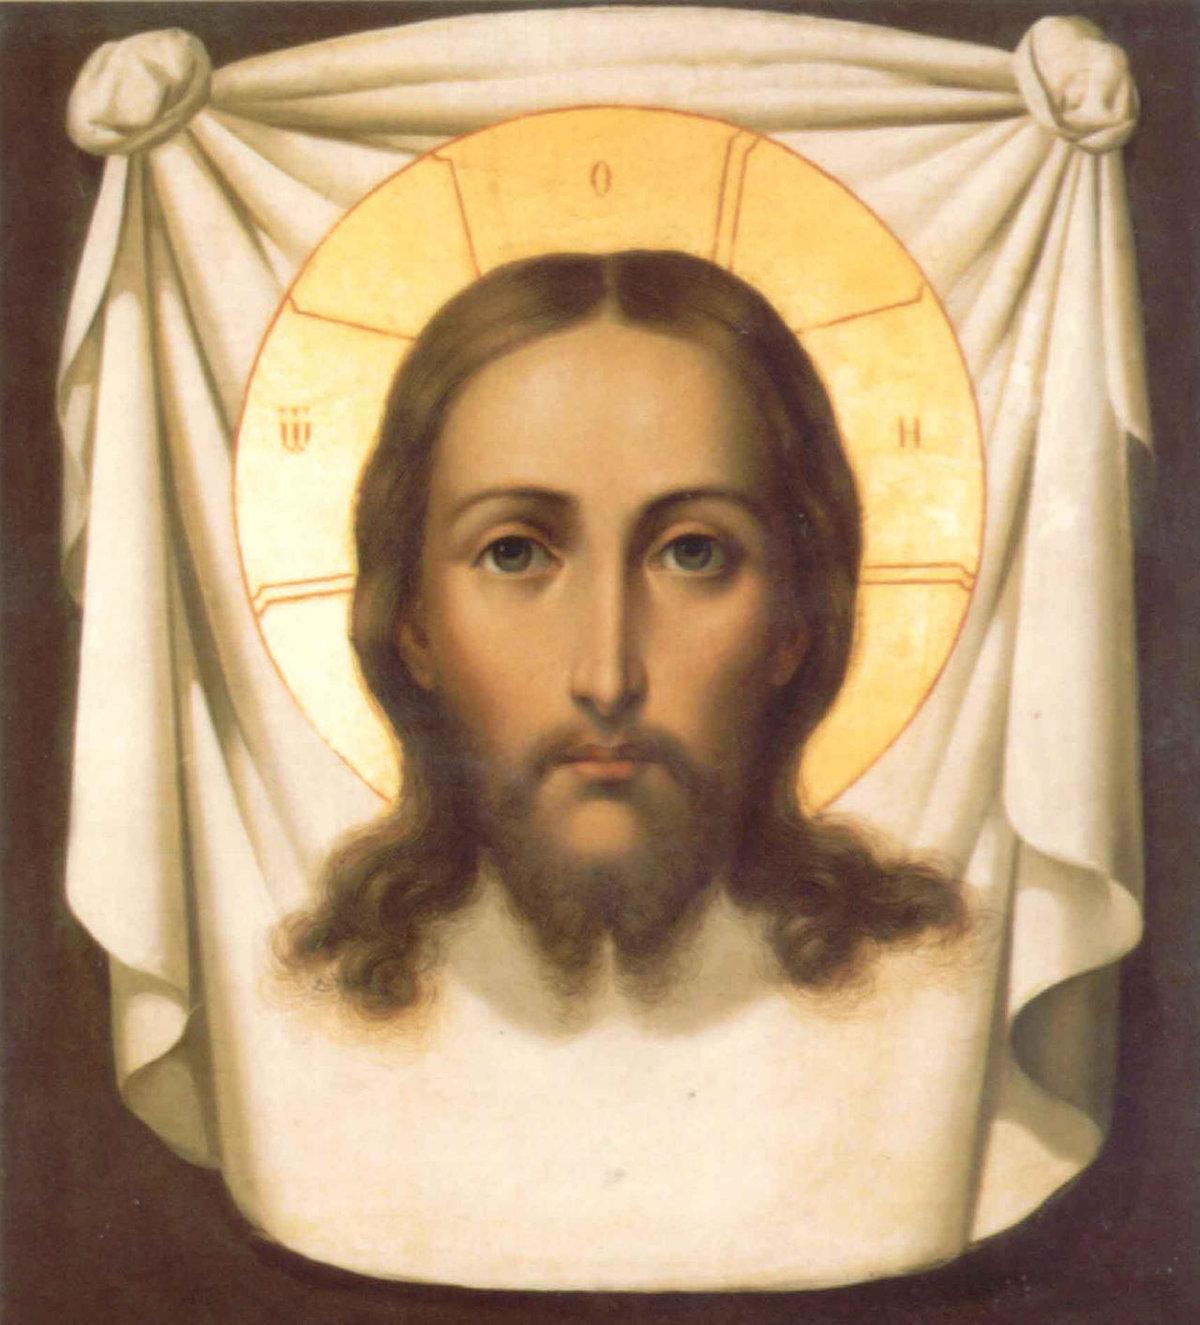 такие картинки как иисус спас нас техноиндустрии